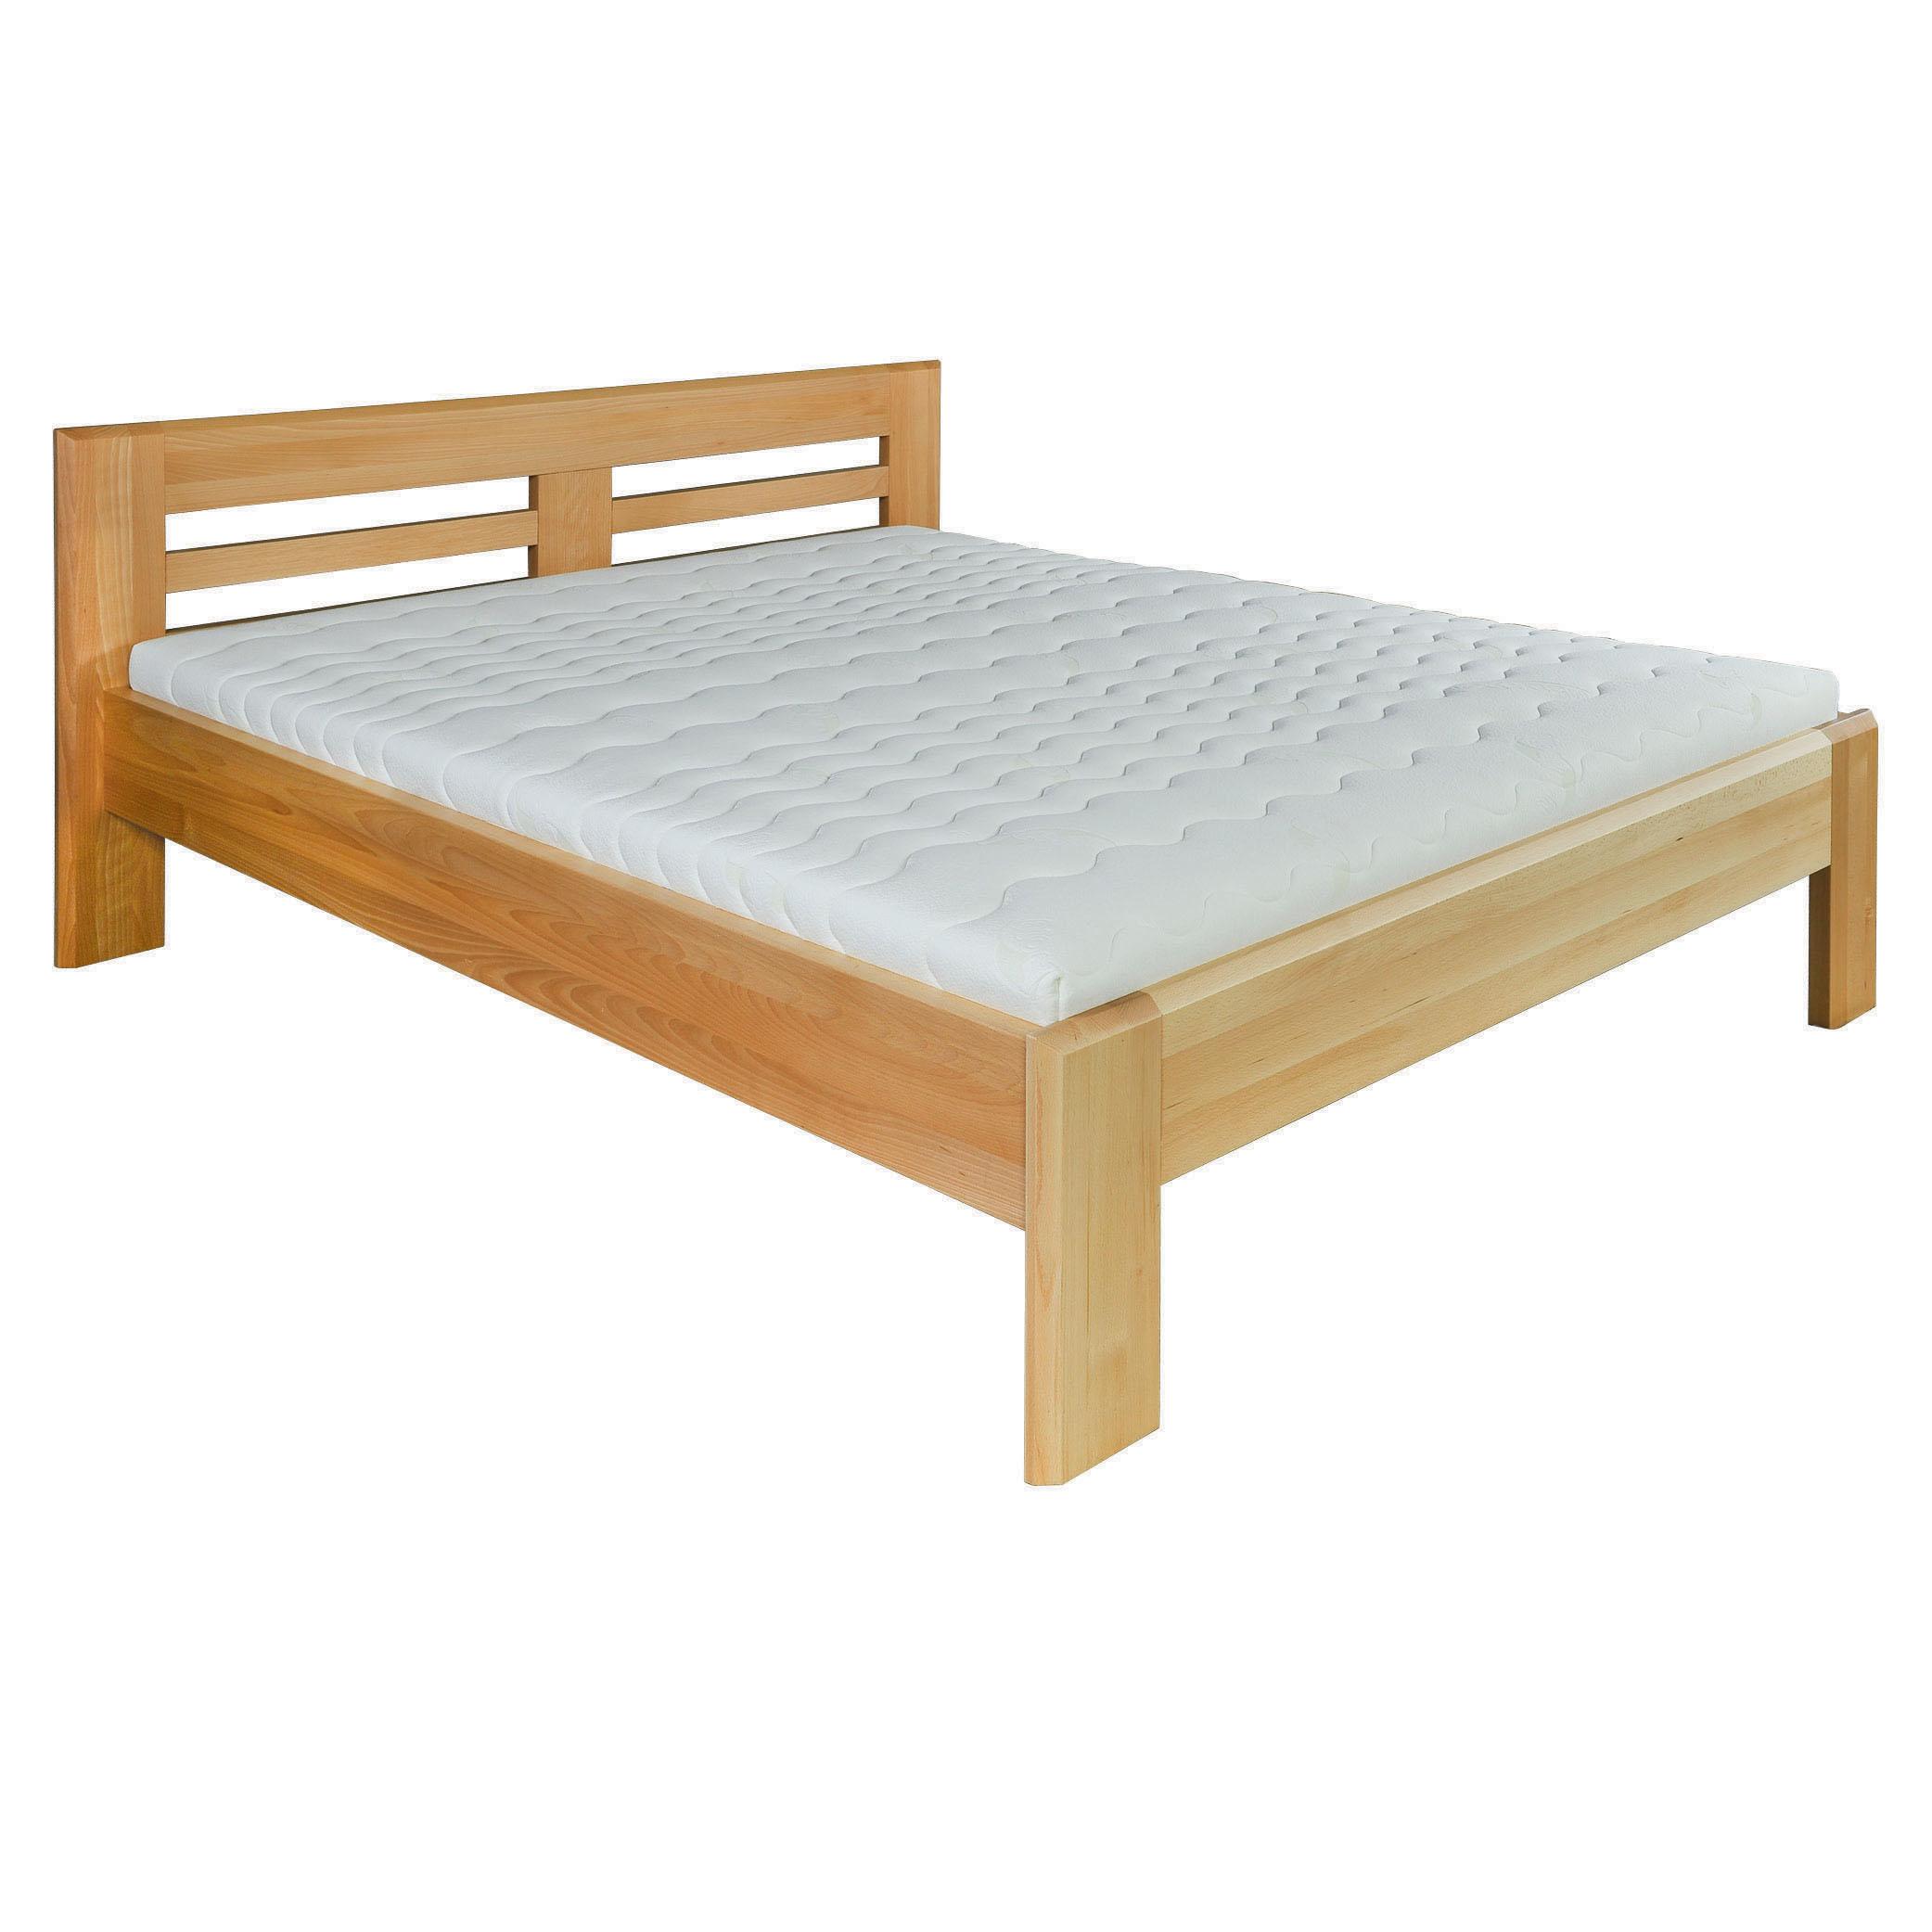 Jednolůžková postel 120 cm - Drewmax - LK 111 (buk) (masiv)